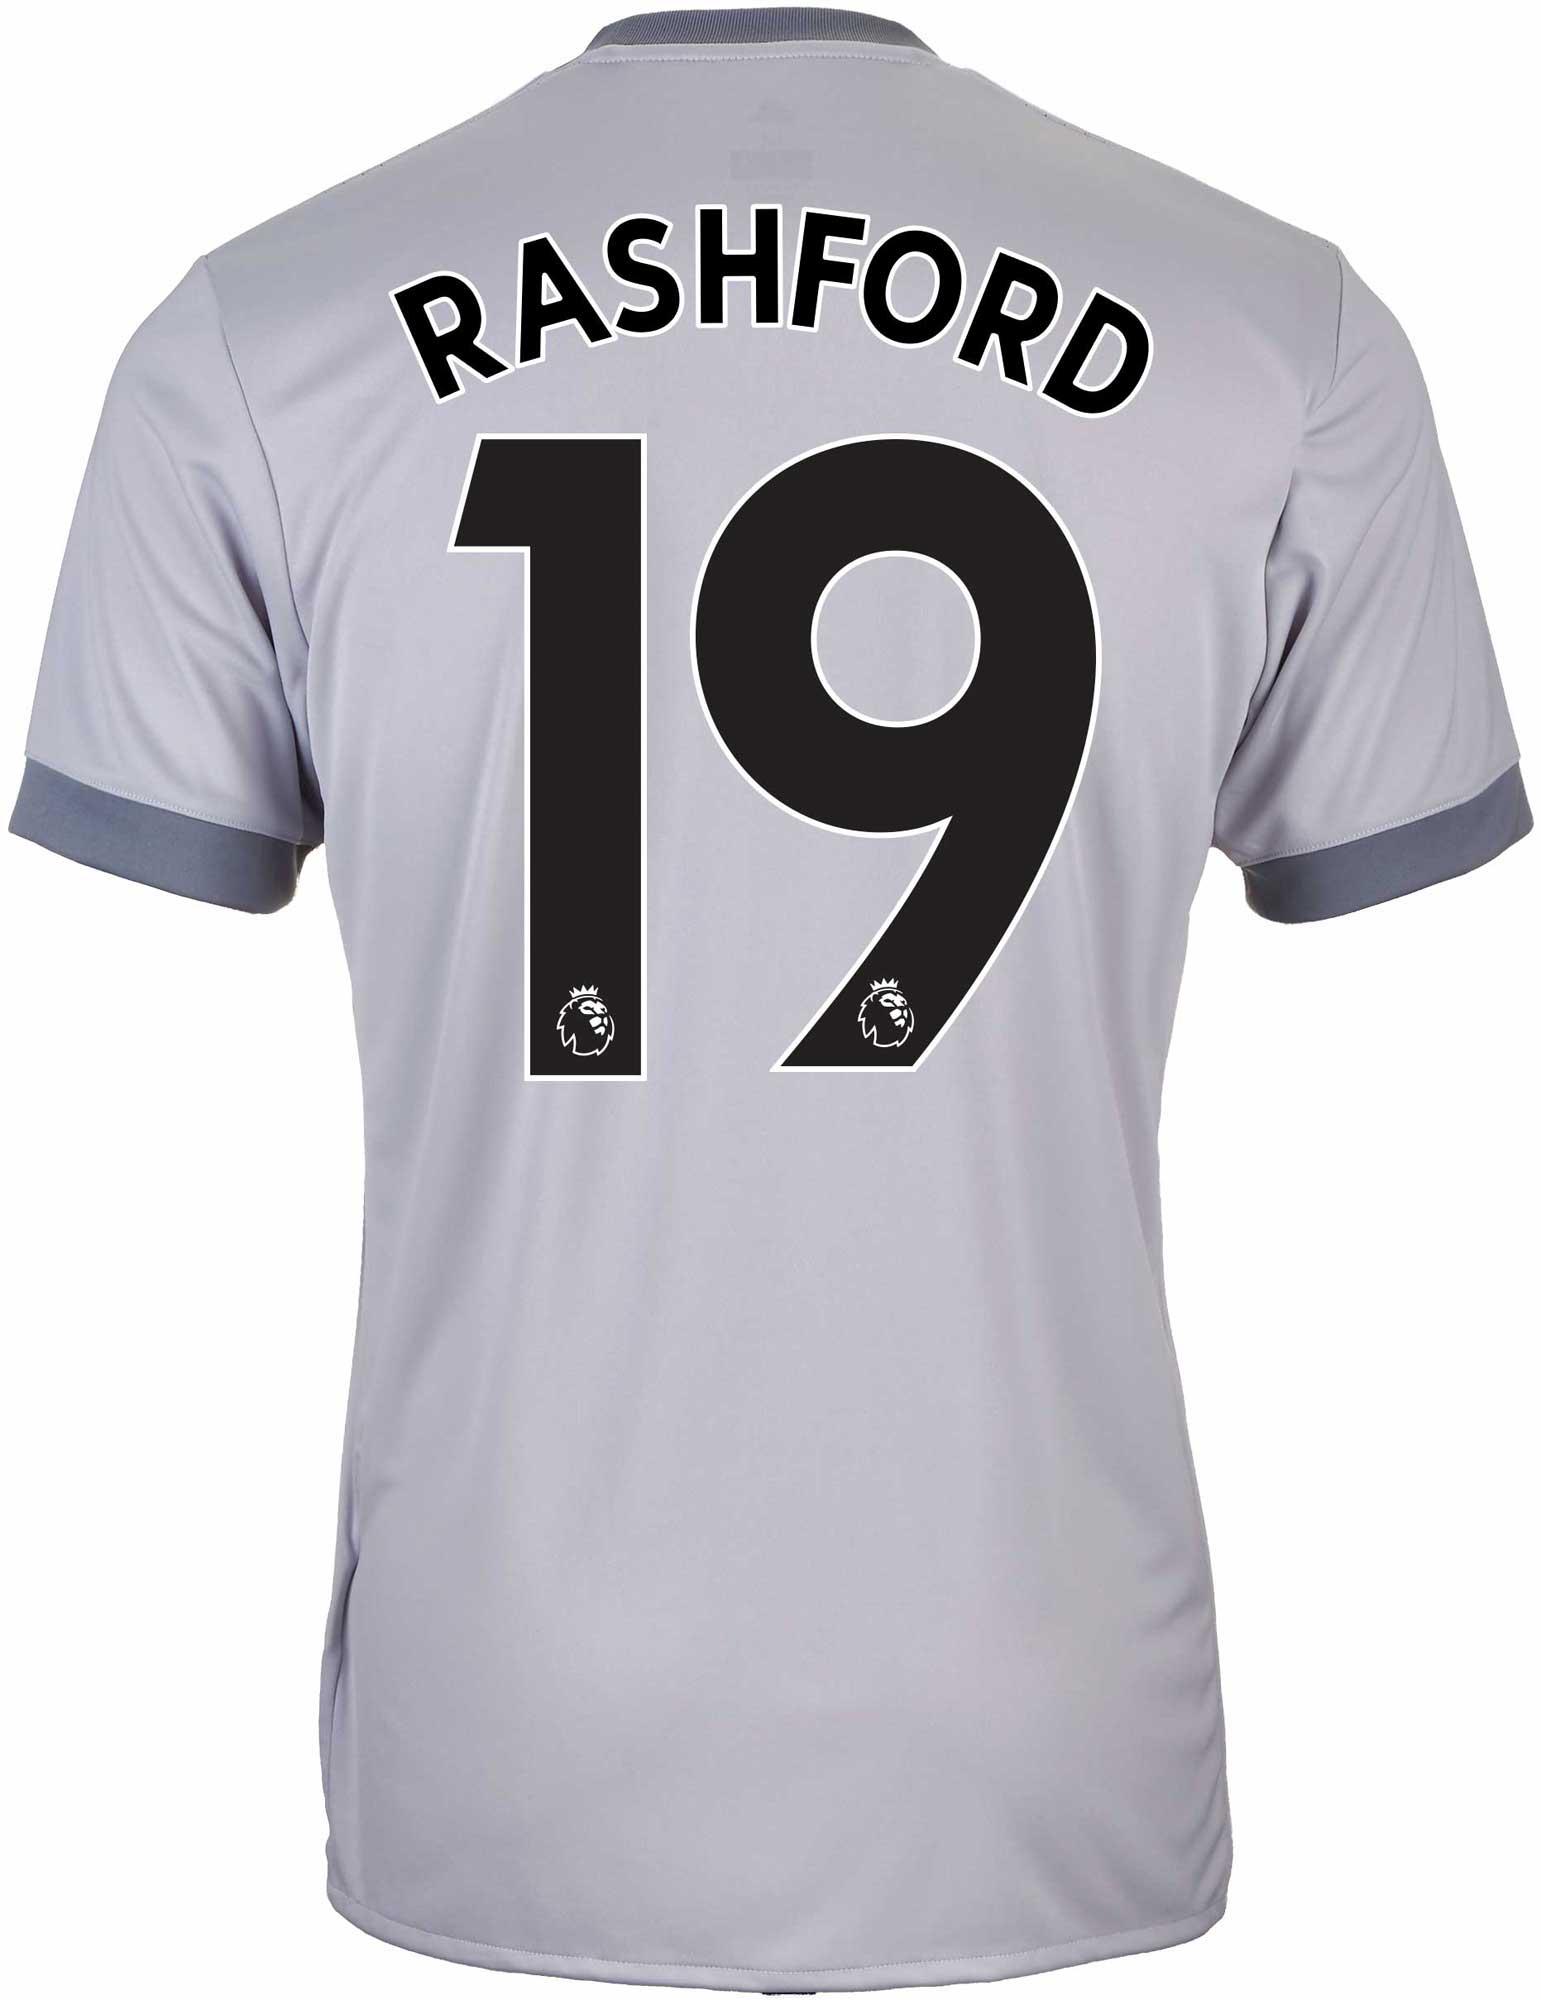 aca61a470 ... 2018 19 adidas cd131 64765  denmark 2017 18 adidas marcus rashford  manchester united 3rd jersey d18dc 2d1ba